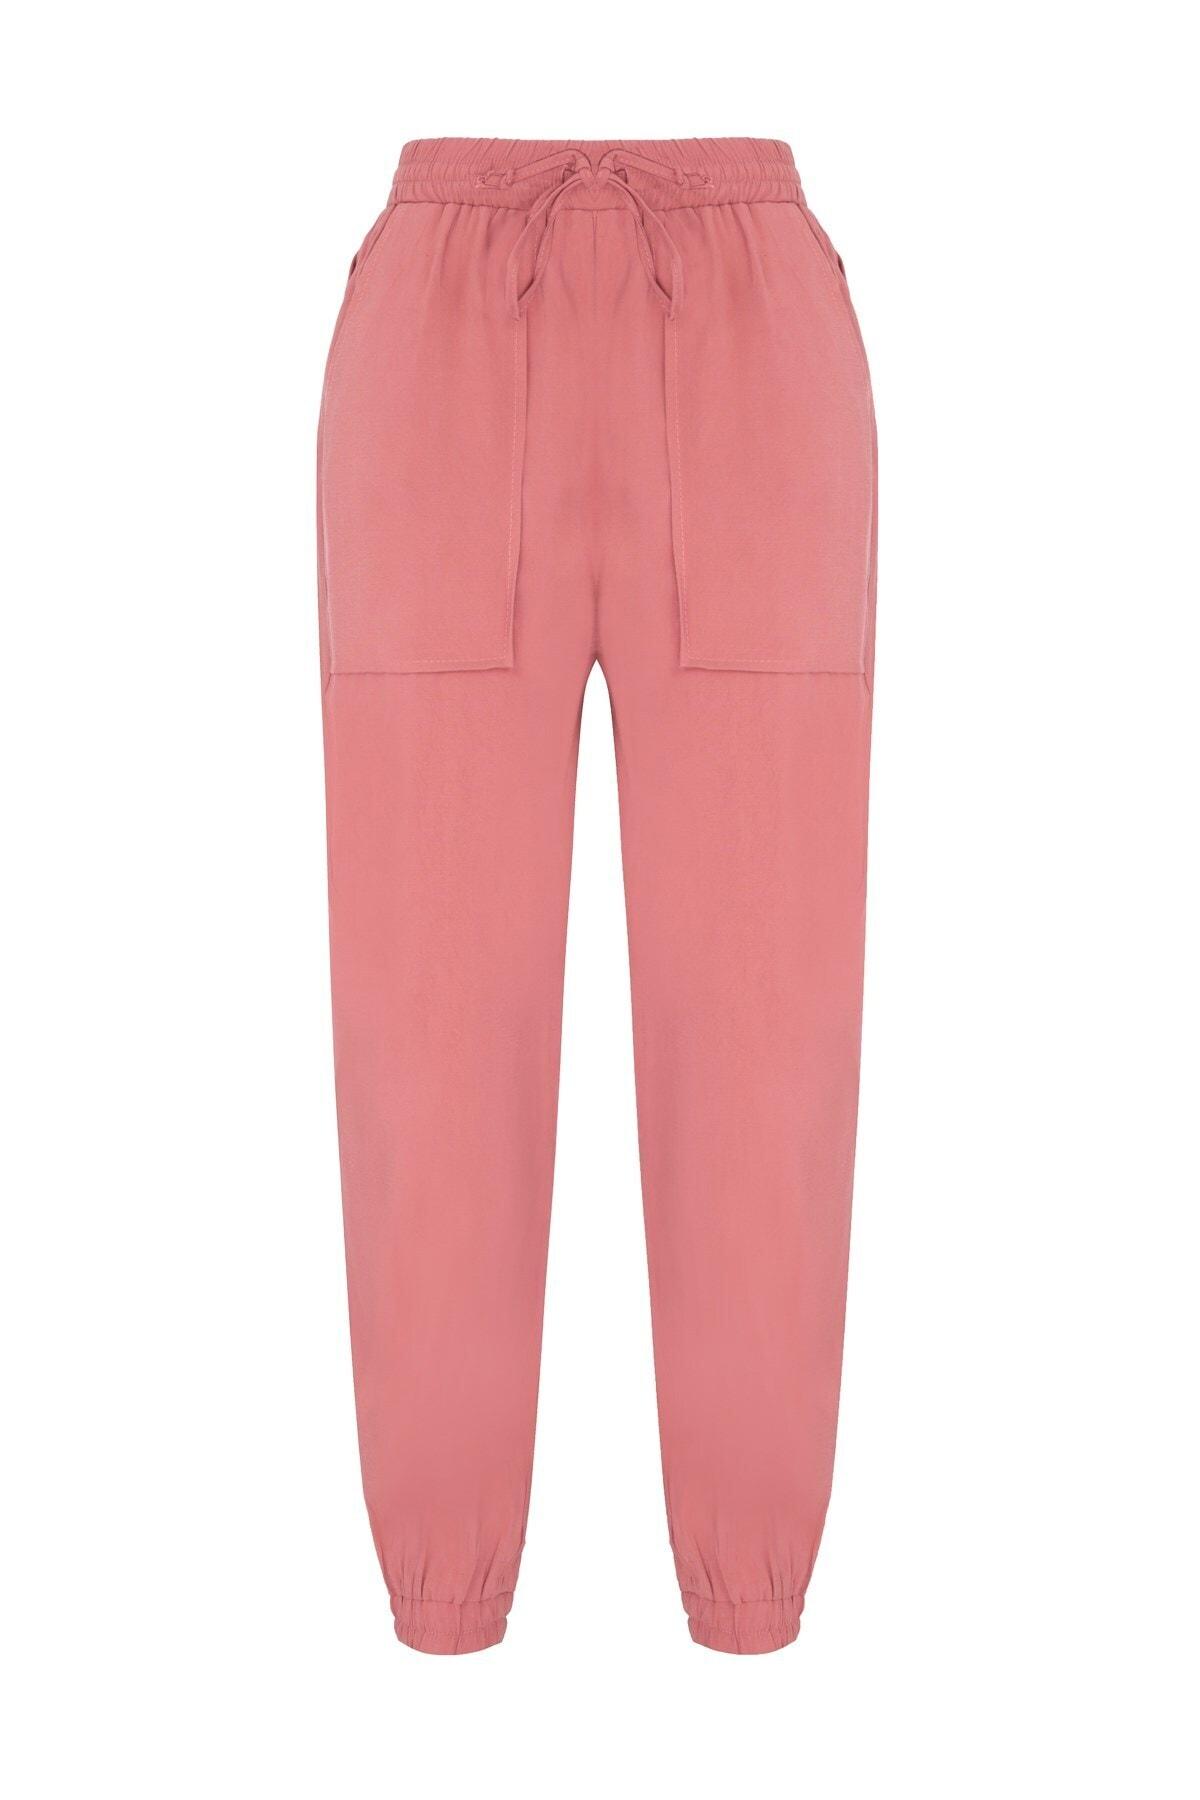 Oblavion Kadın Gülkurusu Beli Lastikli Pantolon 1